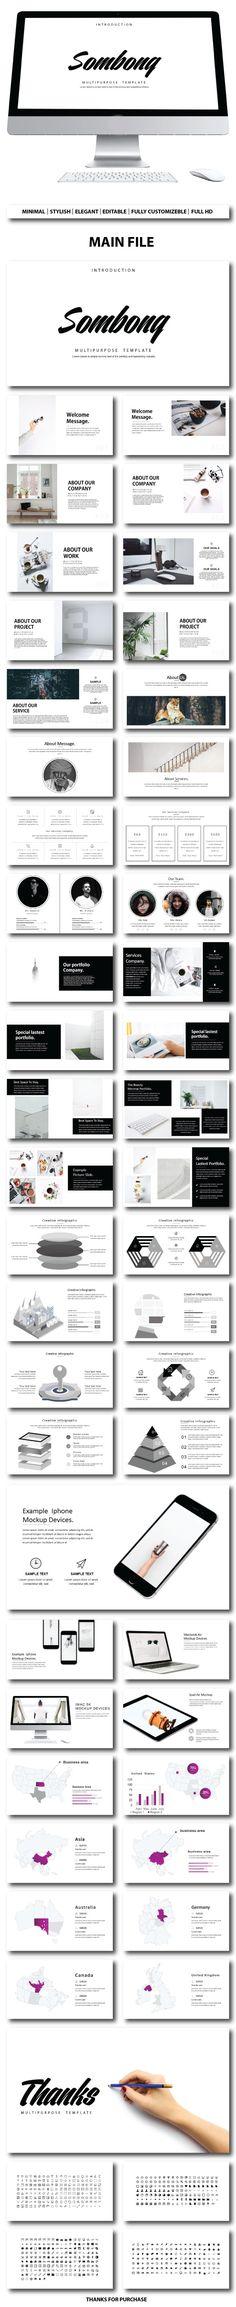 Sombong Presentation Template - PowerPoint Templates Presentation Templates